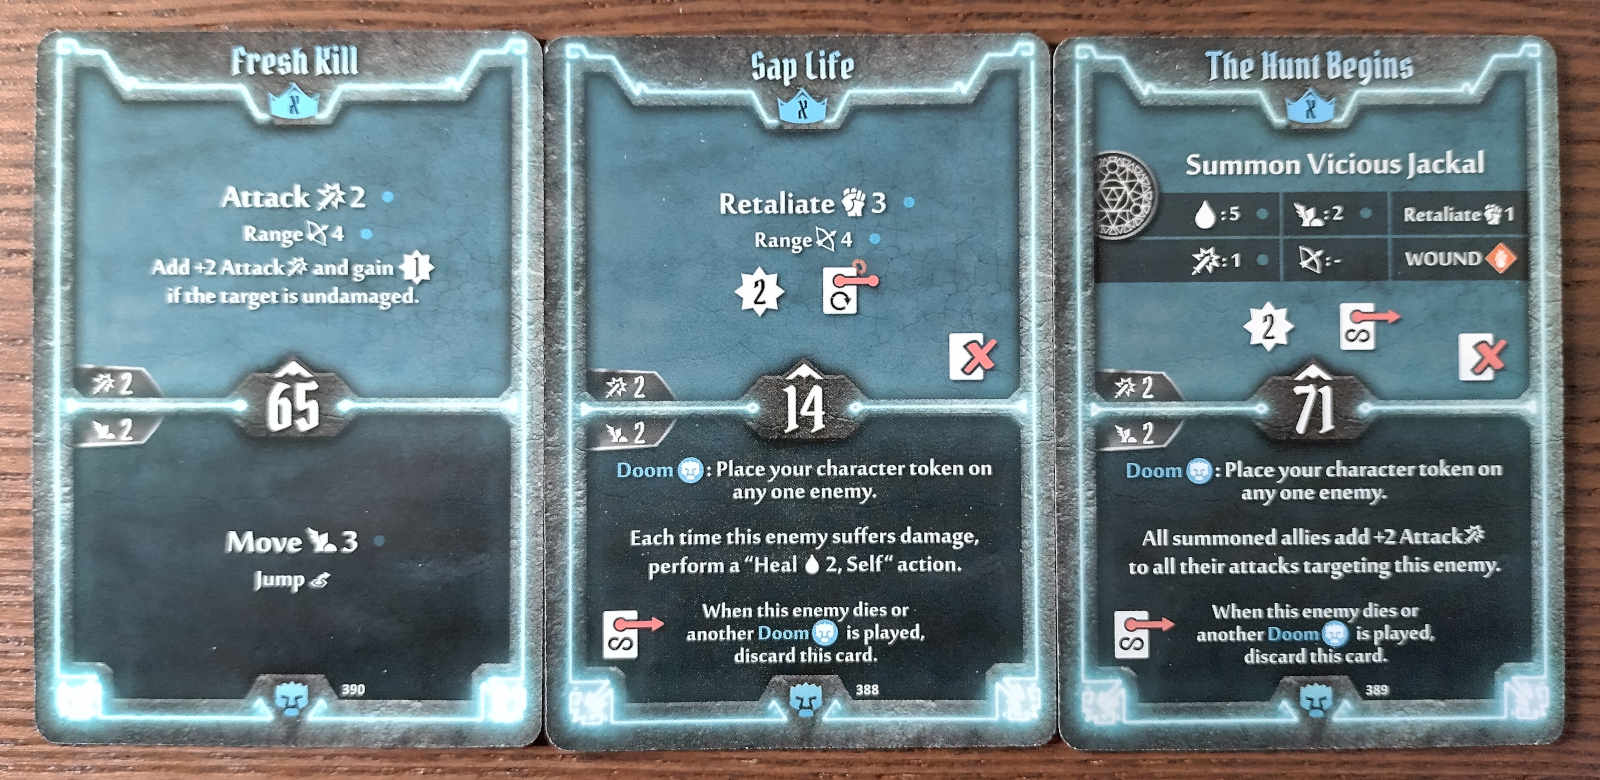 Doomstalker level X cards - Fresh Kill, Sap Life, and the Hunt Begins